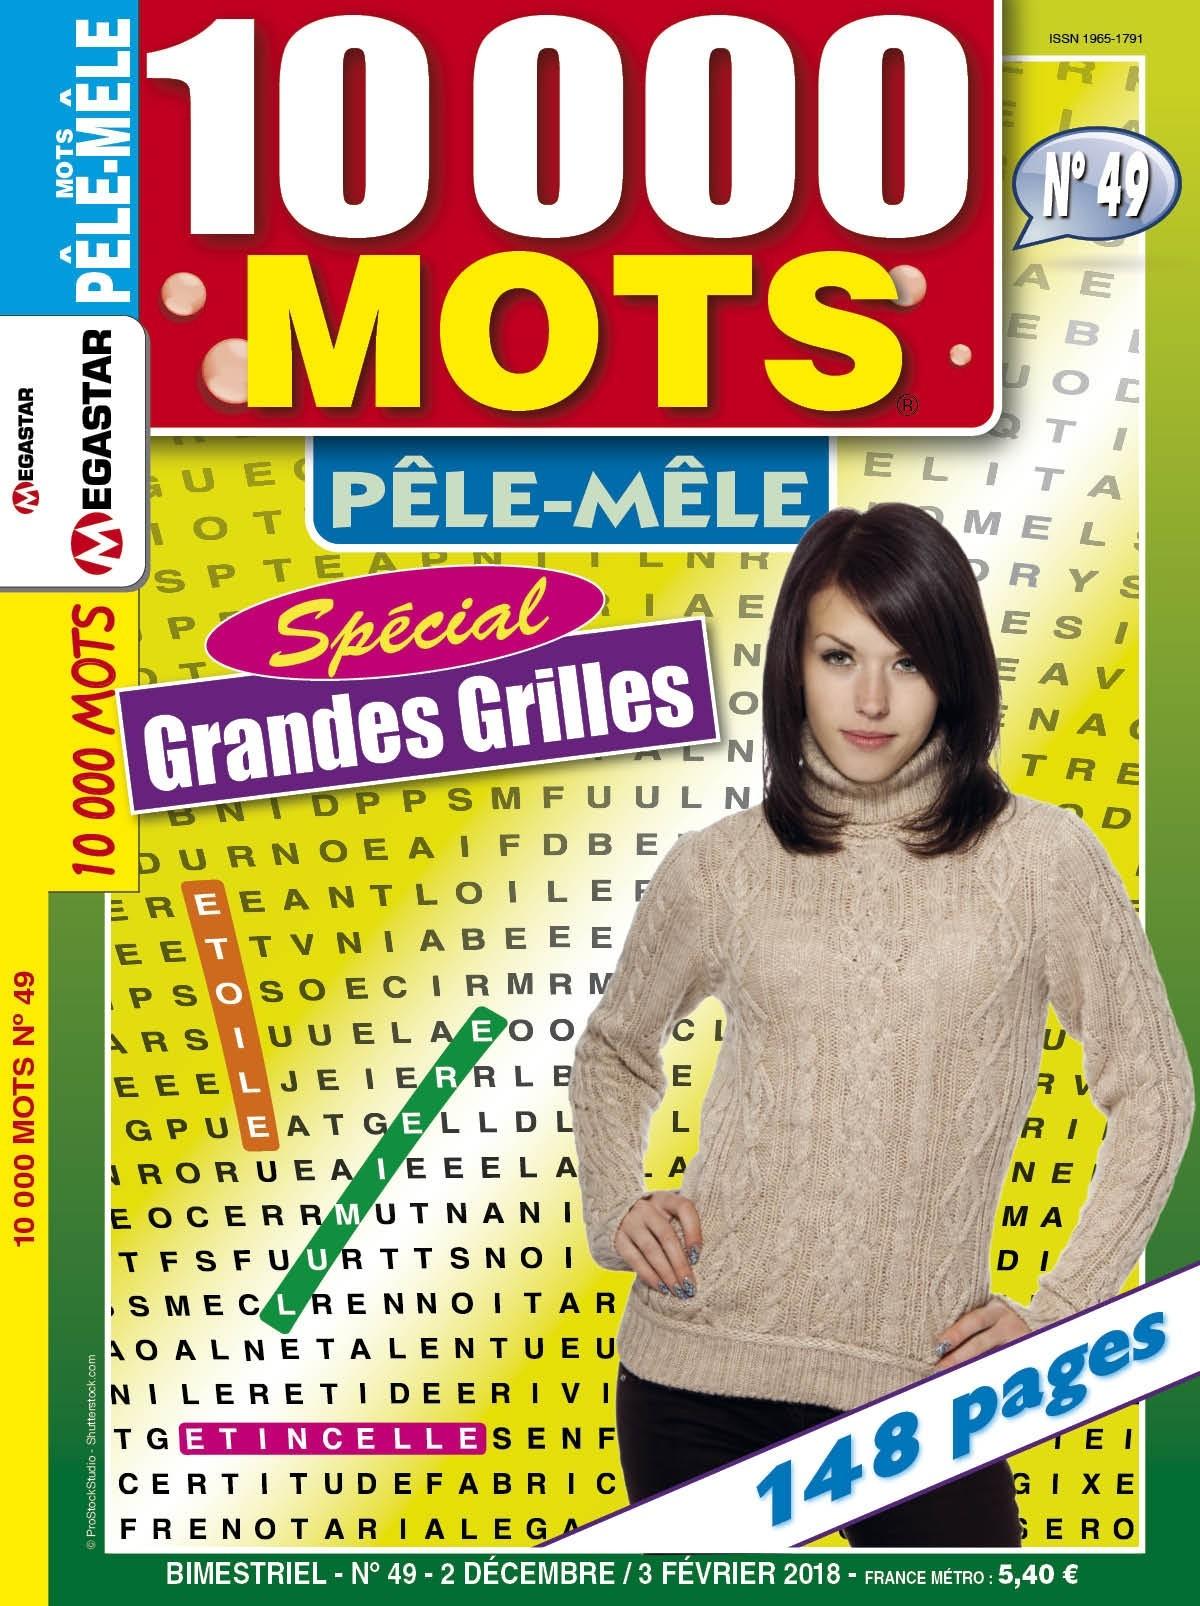 10 000 MOTS